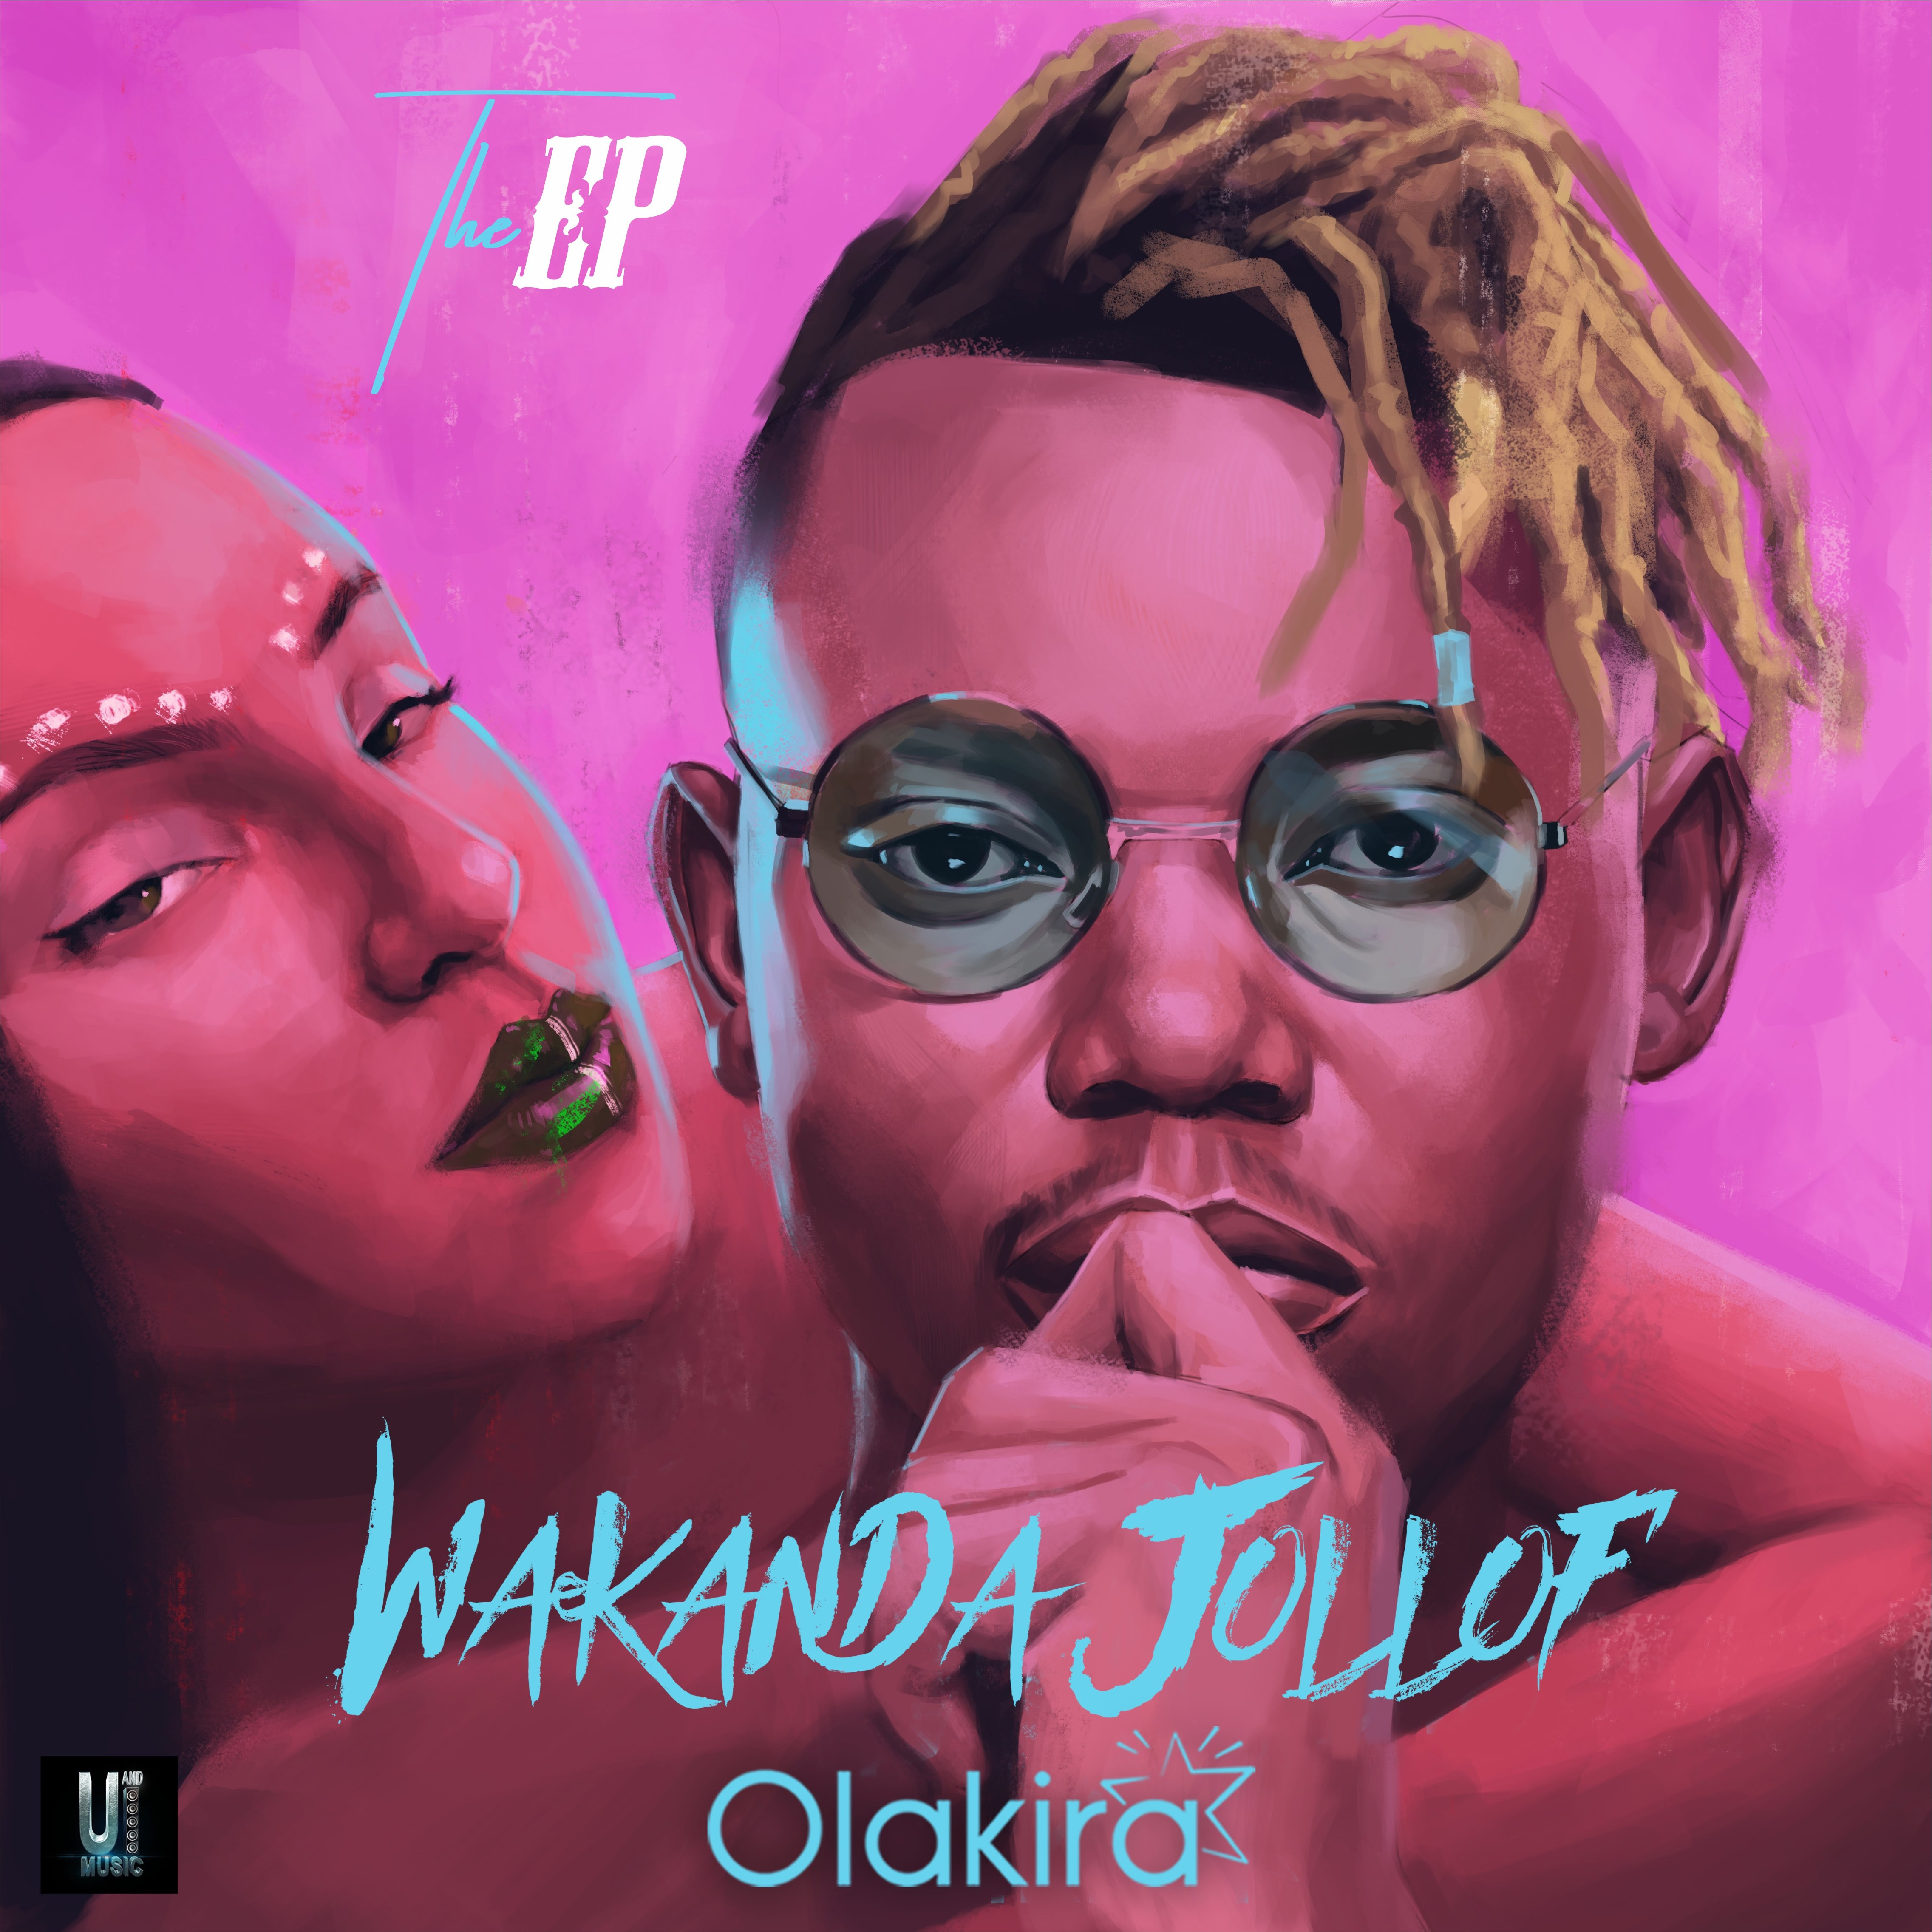 Olakira – Wakanda Jollof EP | Summer Time (Lyrics Video)